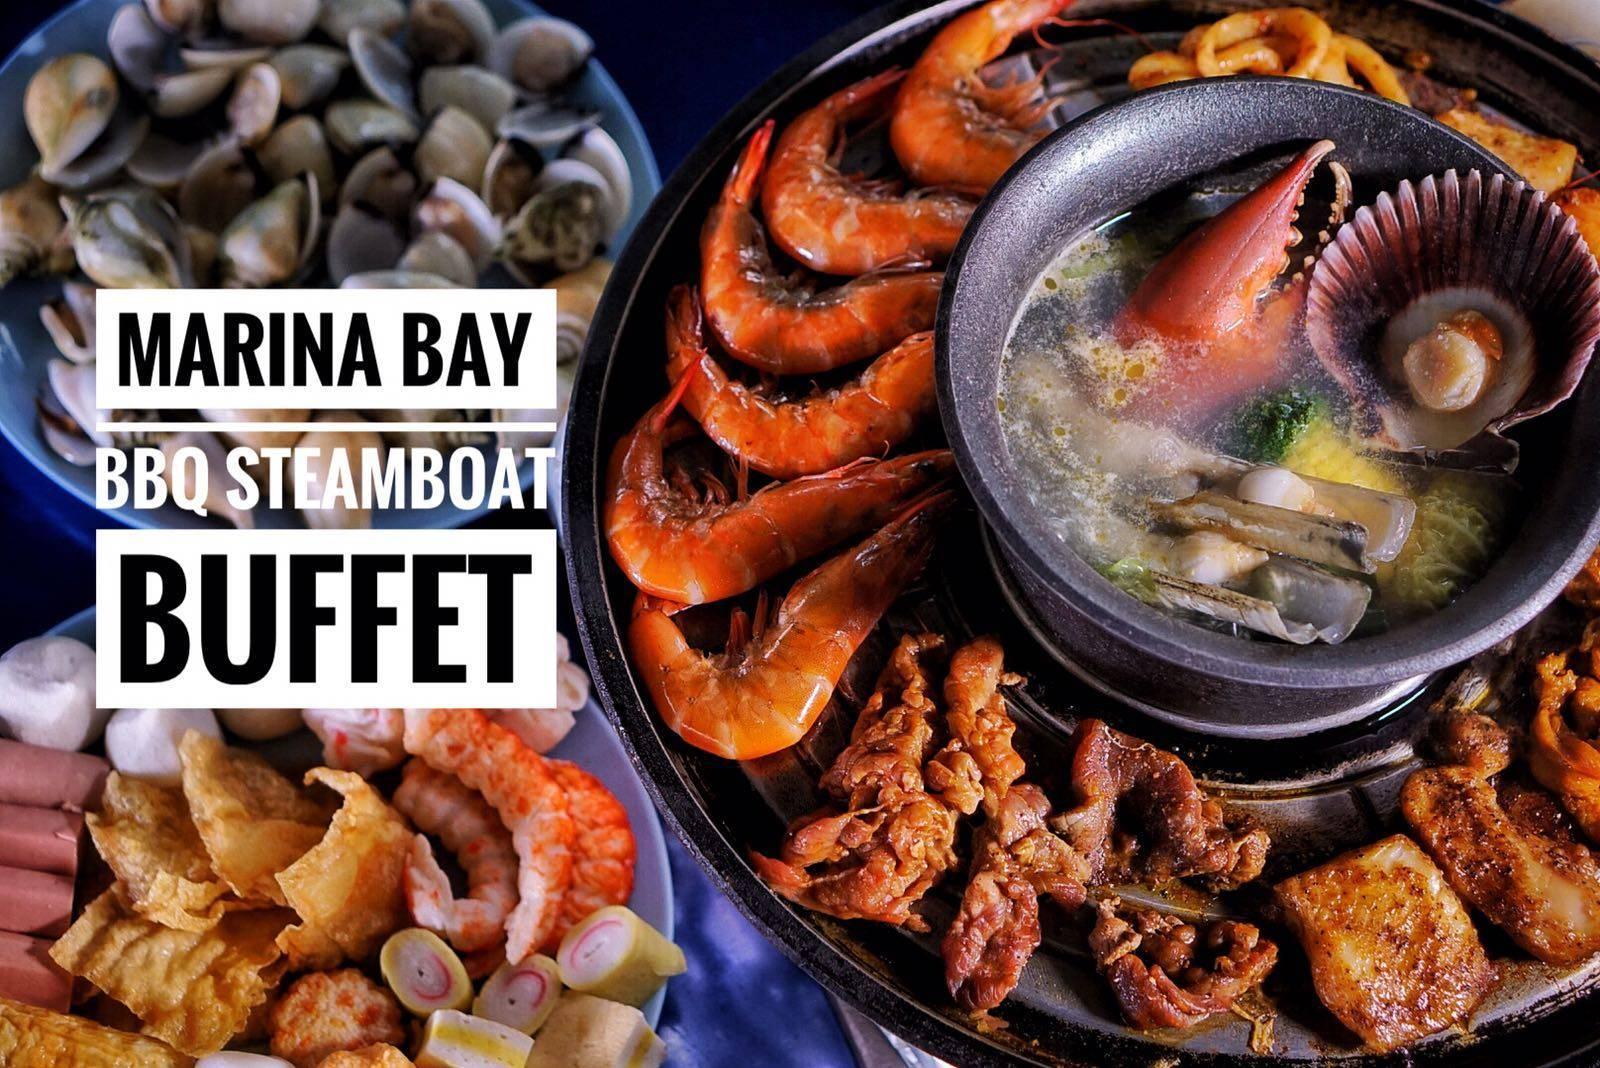 Marina Bay BBQ Steamboat Halal Buffet